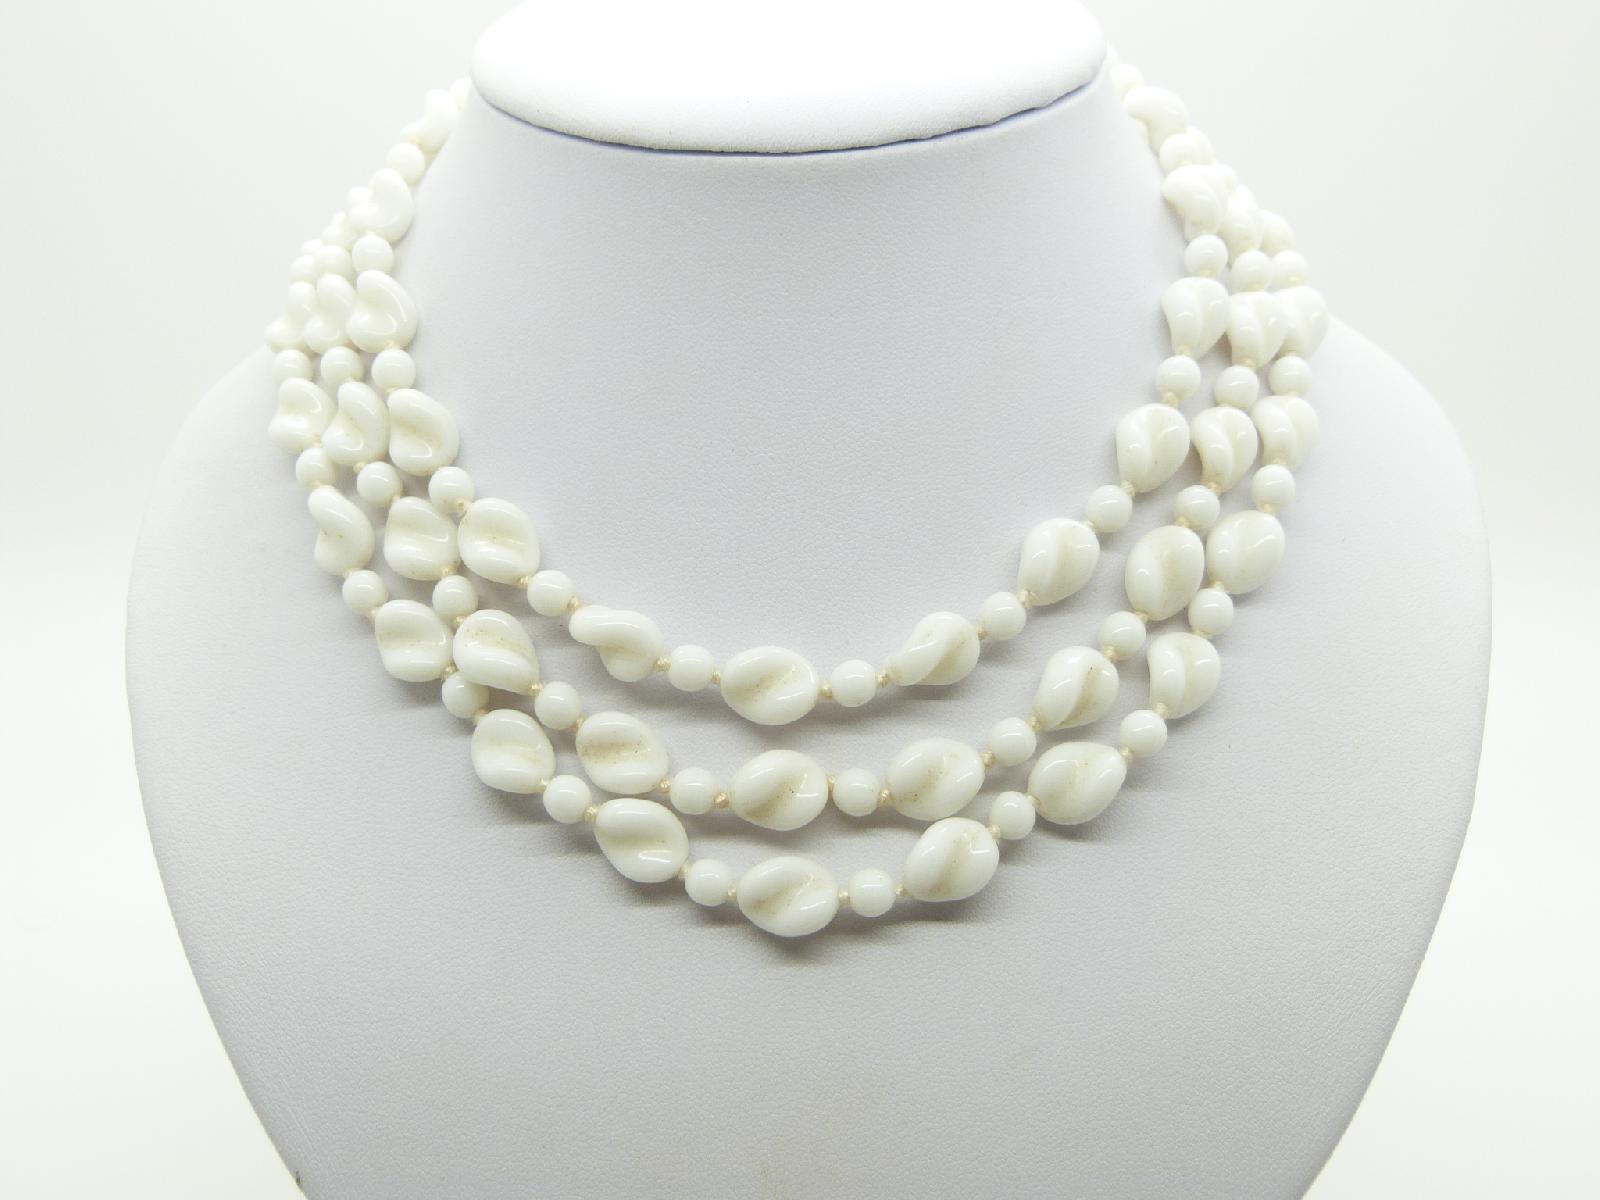 Vintage 50s Pretty Three Row White Glass Swirl Bead Necklace Length 46cms